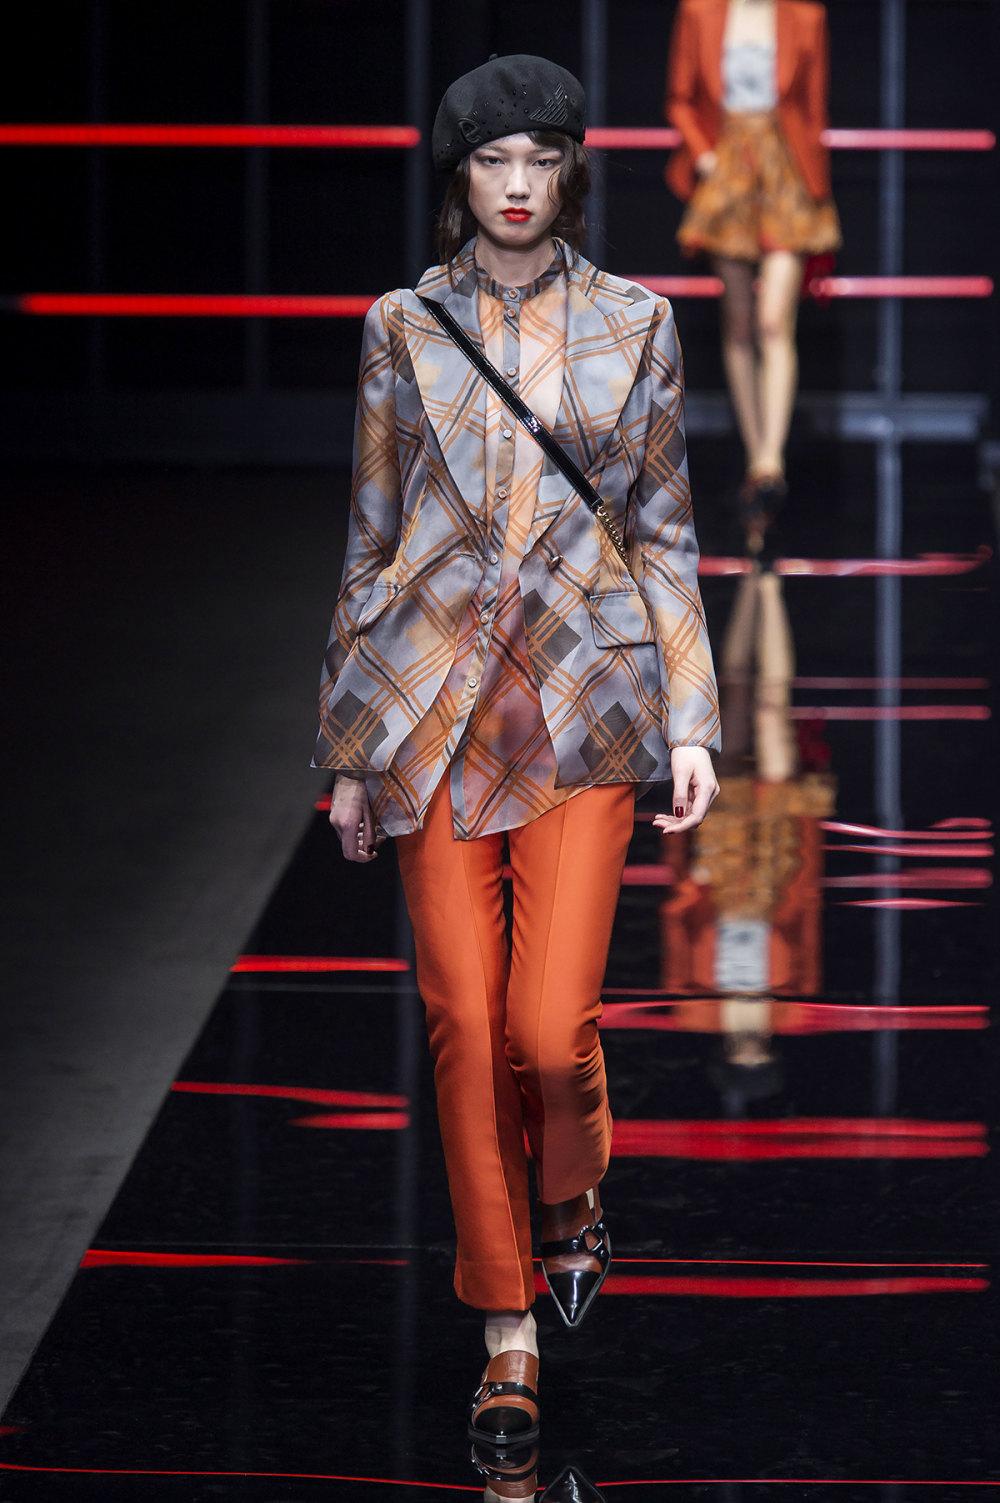 Emporio Armani时装系列畅的裤子带有柔滑裙子的鸡尾酒礼服-14.jpg